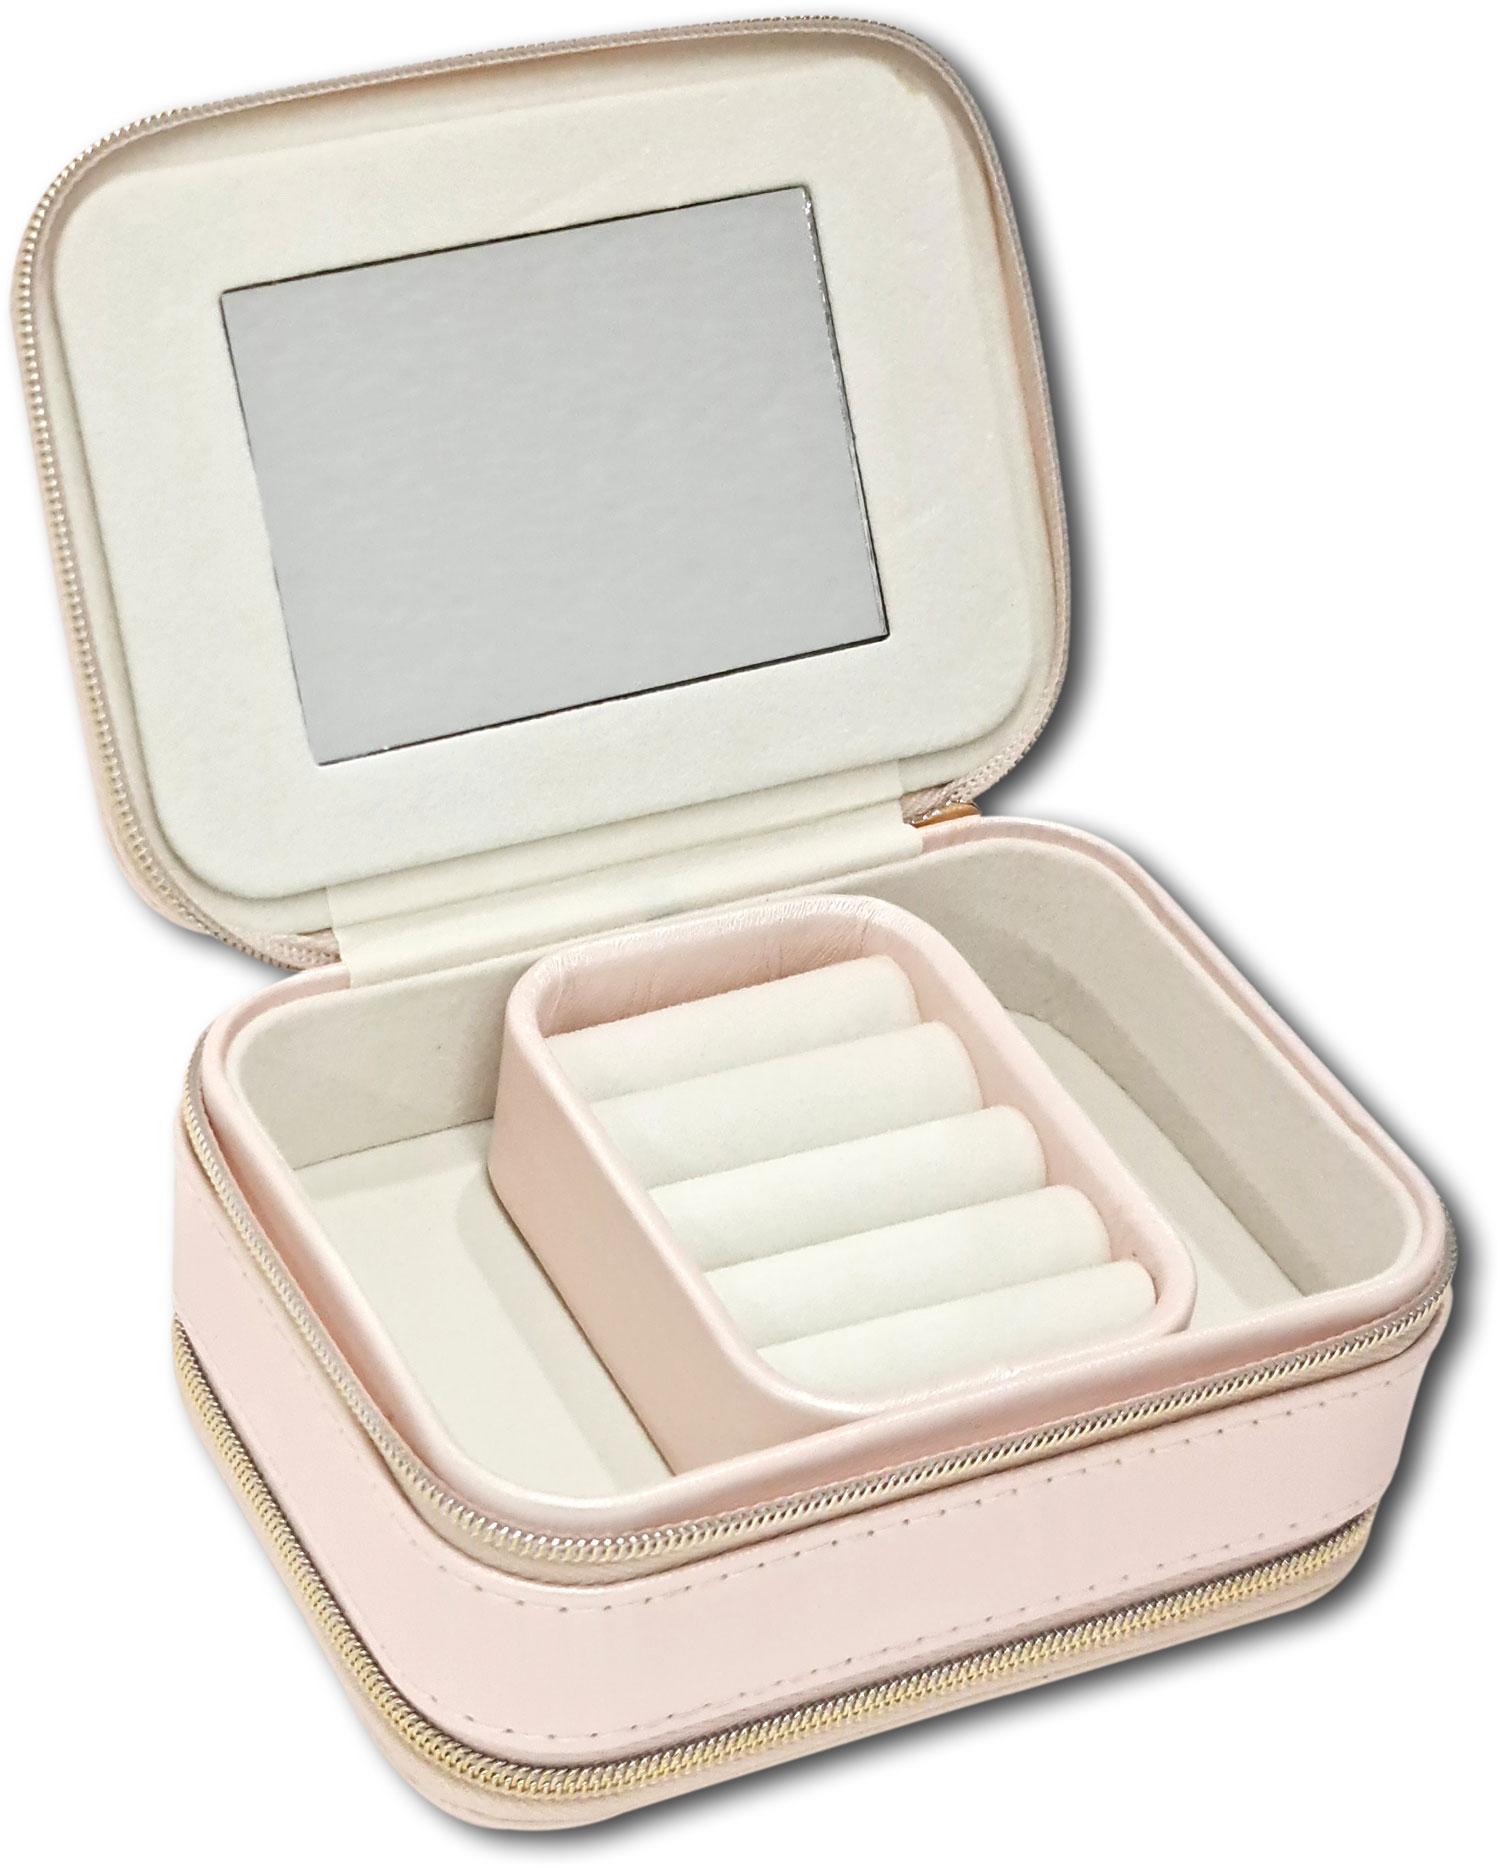 Mini Porta-Joias duplo retangular - Rosa bebê / Marfim